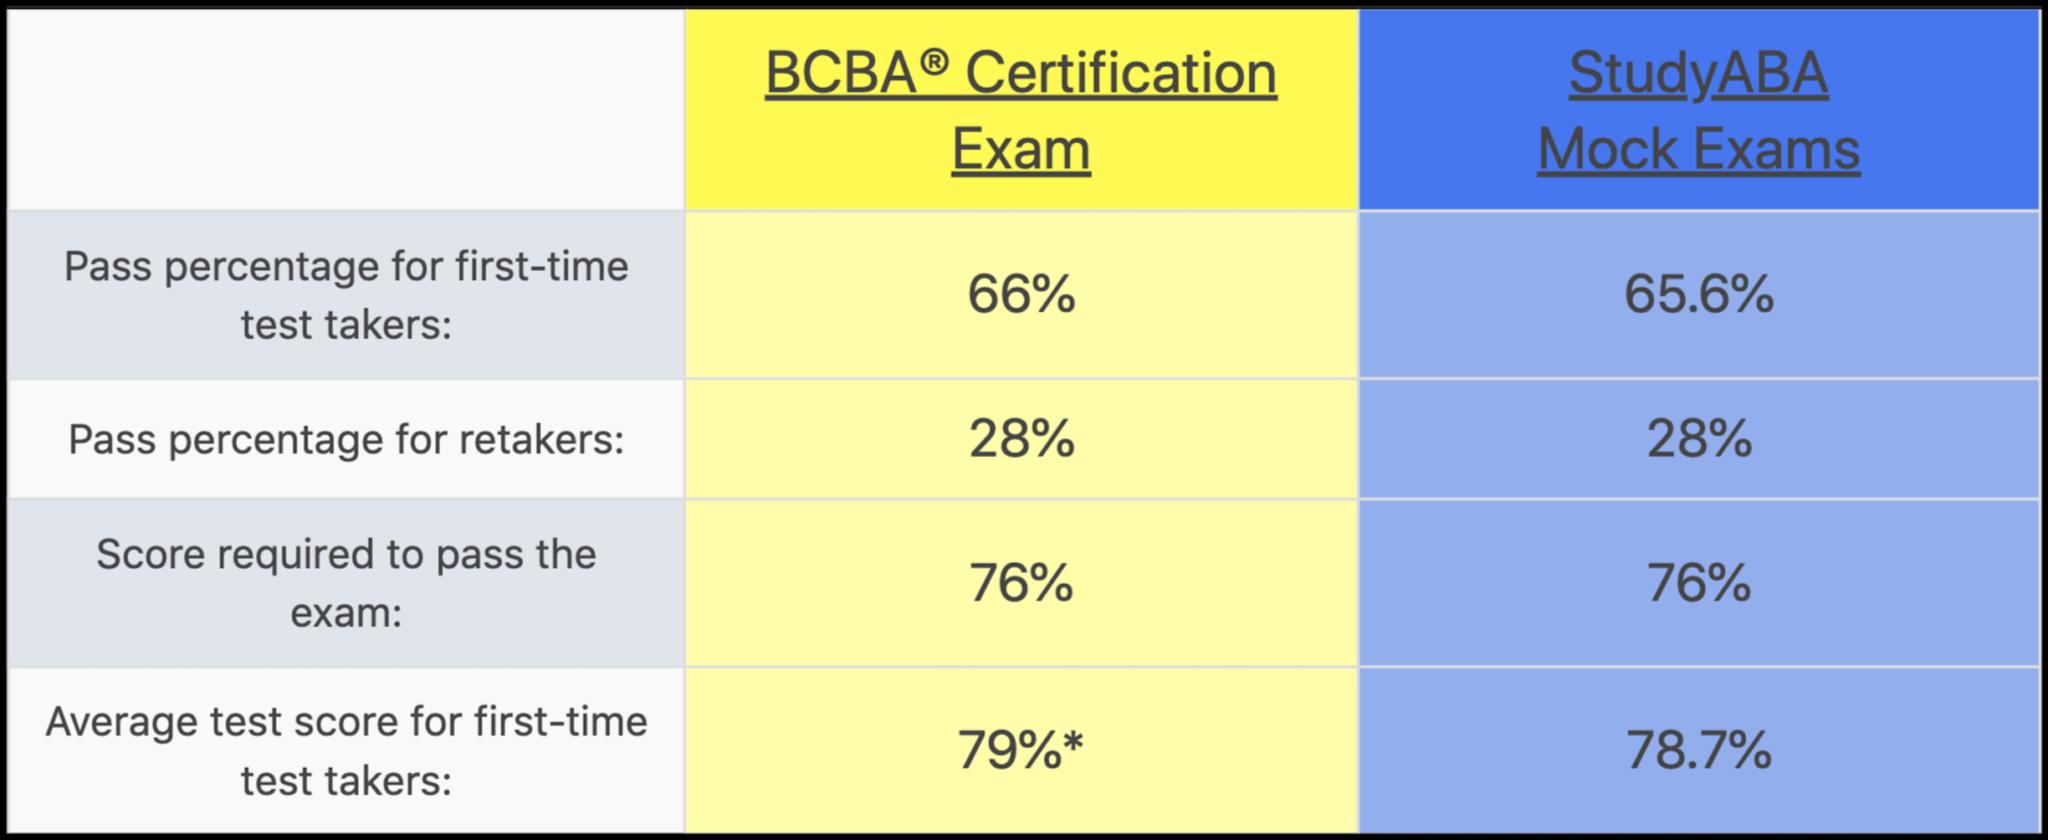 bcba mock exam certification exams pass